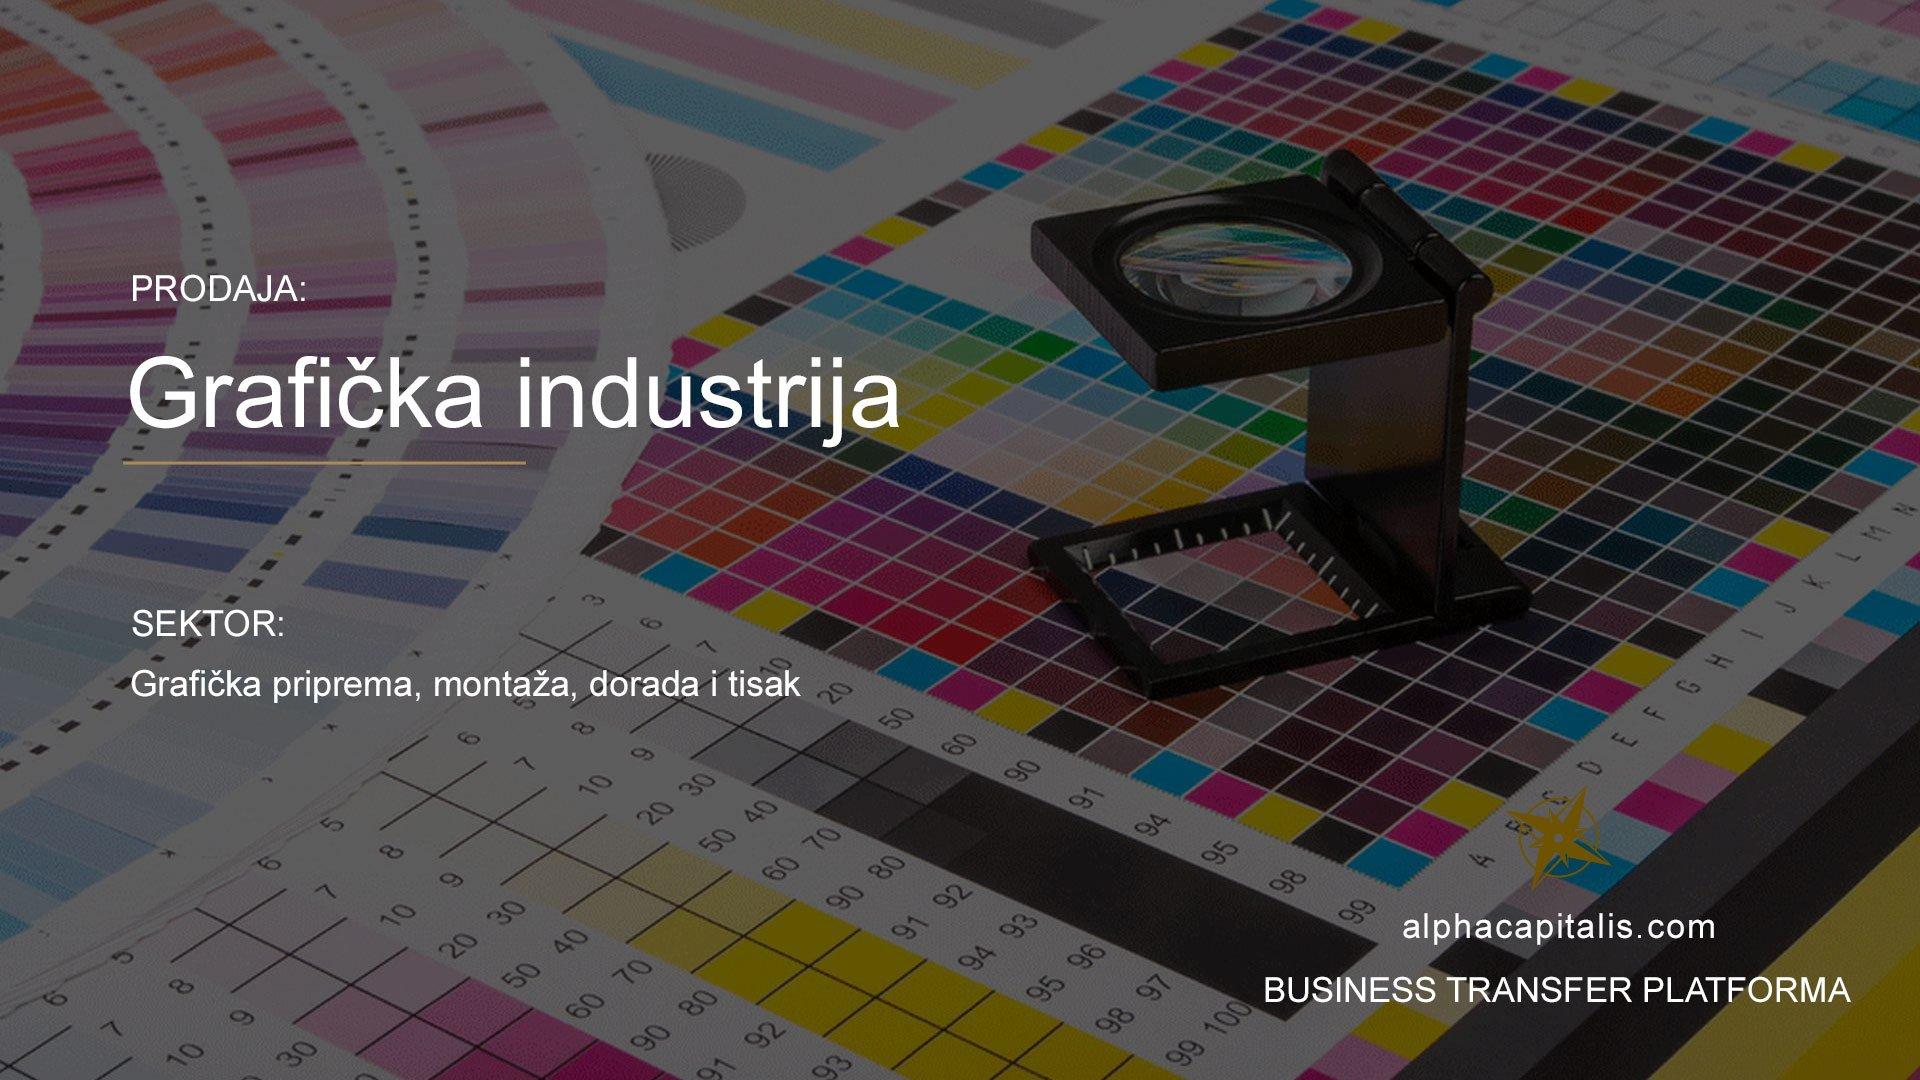 Alpha-Capitalis--Business-Transfer-Platforma_047_grafička-industrija